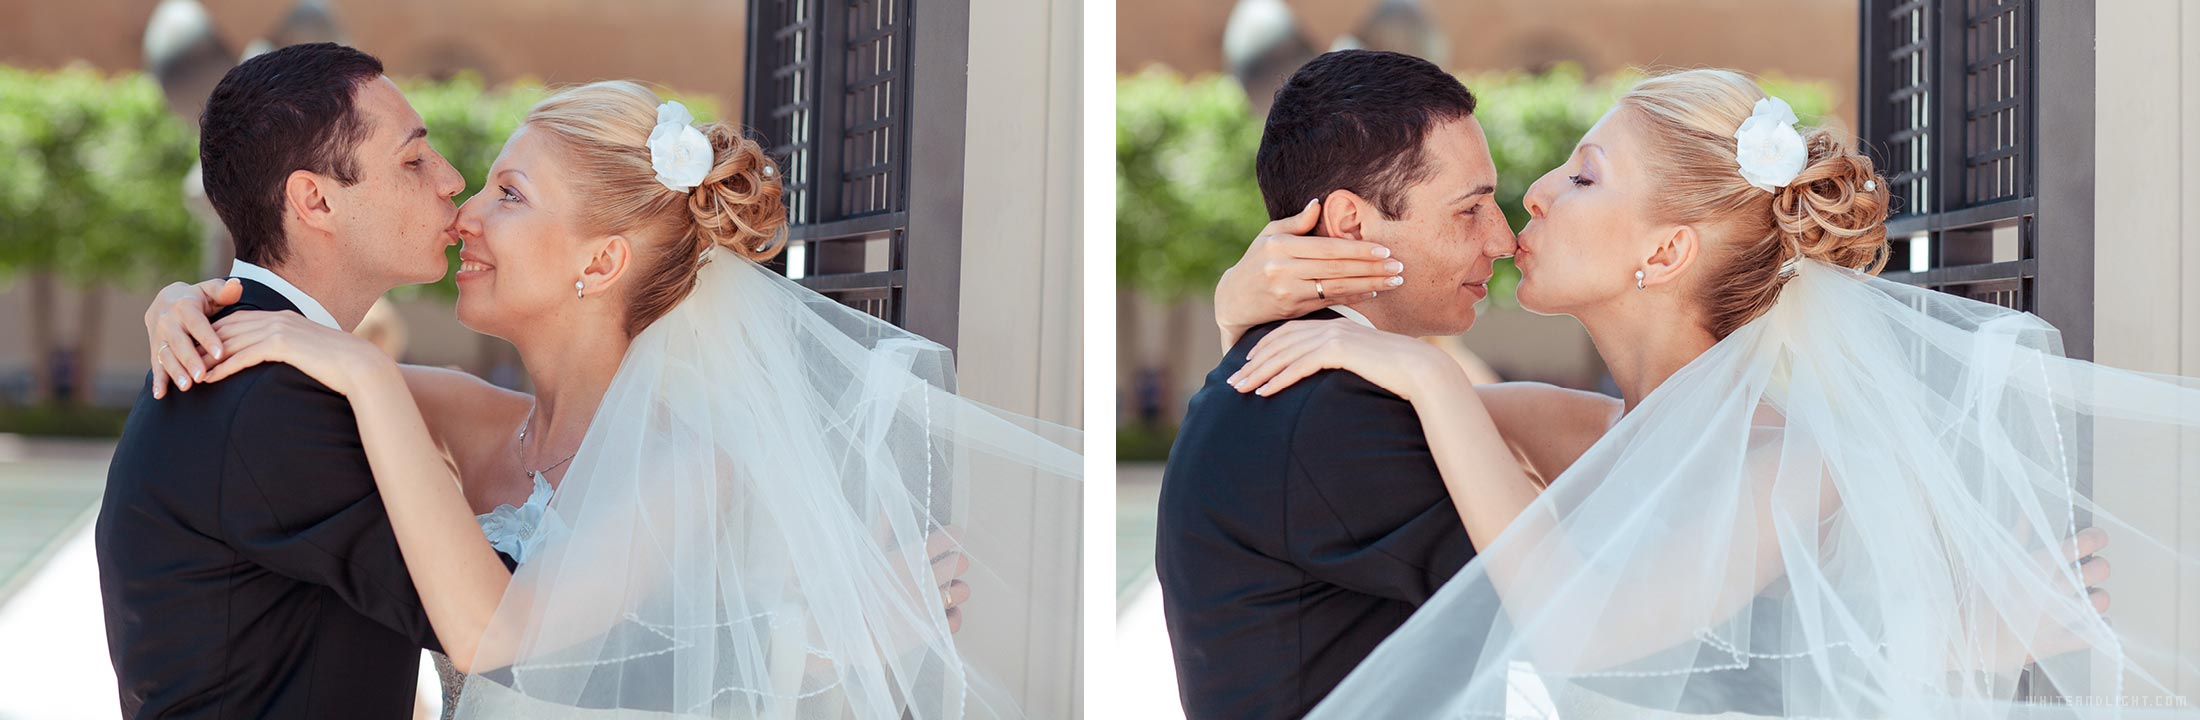 Wedding photographer Blog - weddingbands